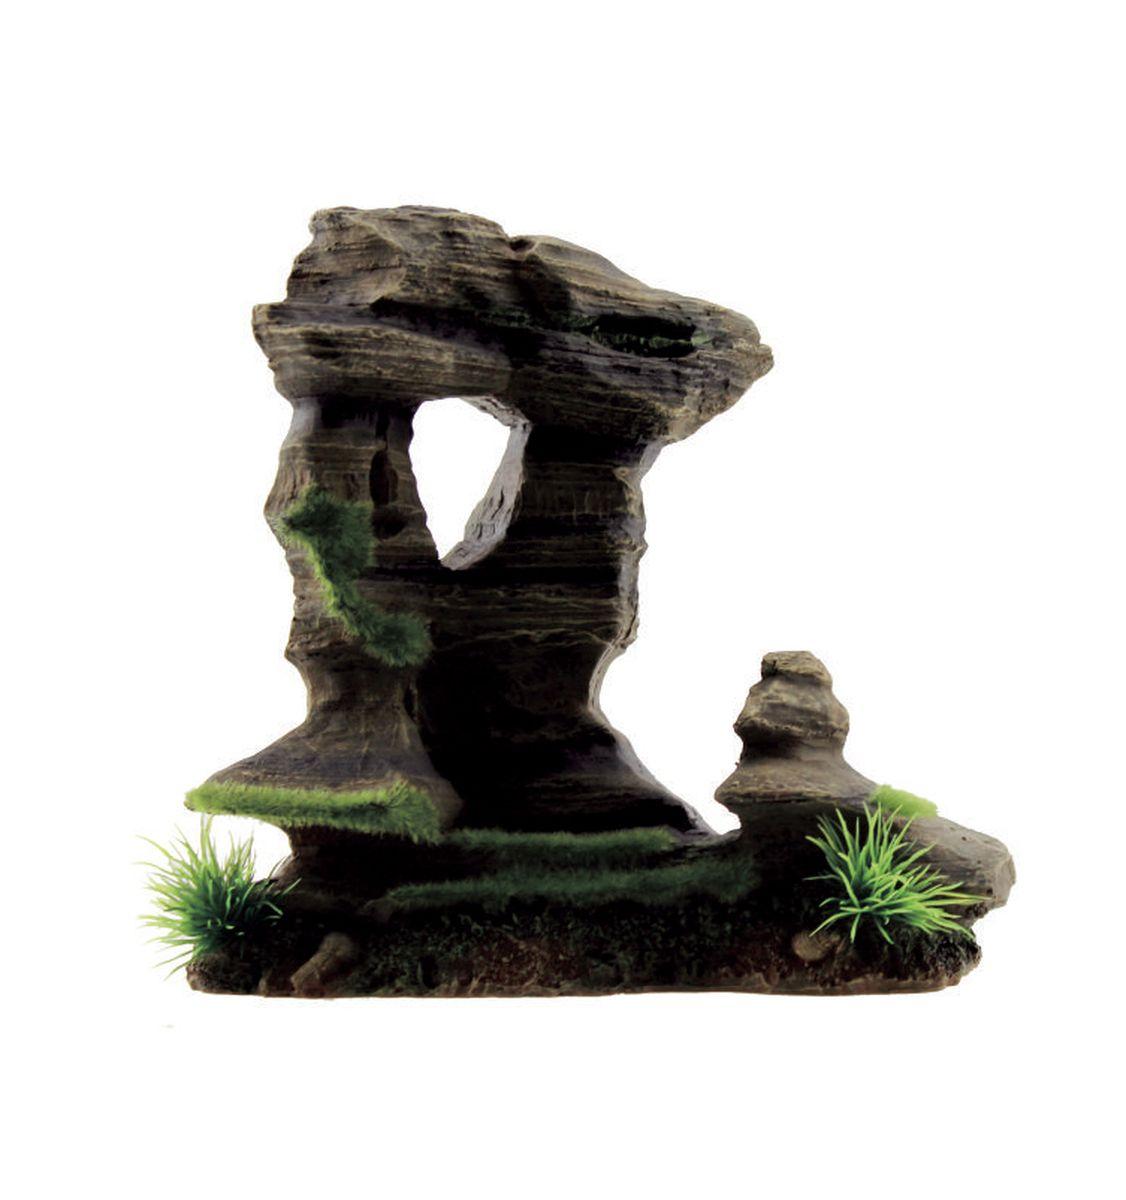 Декорация для аквариума ArtUniq Фигурная скала со мхом, 20 x 11,5 x 19,5 см0120710Декорация для аквариума ArtUniq Фигурная скала со мхом, 20 x 11,5 x 19,5 см